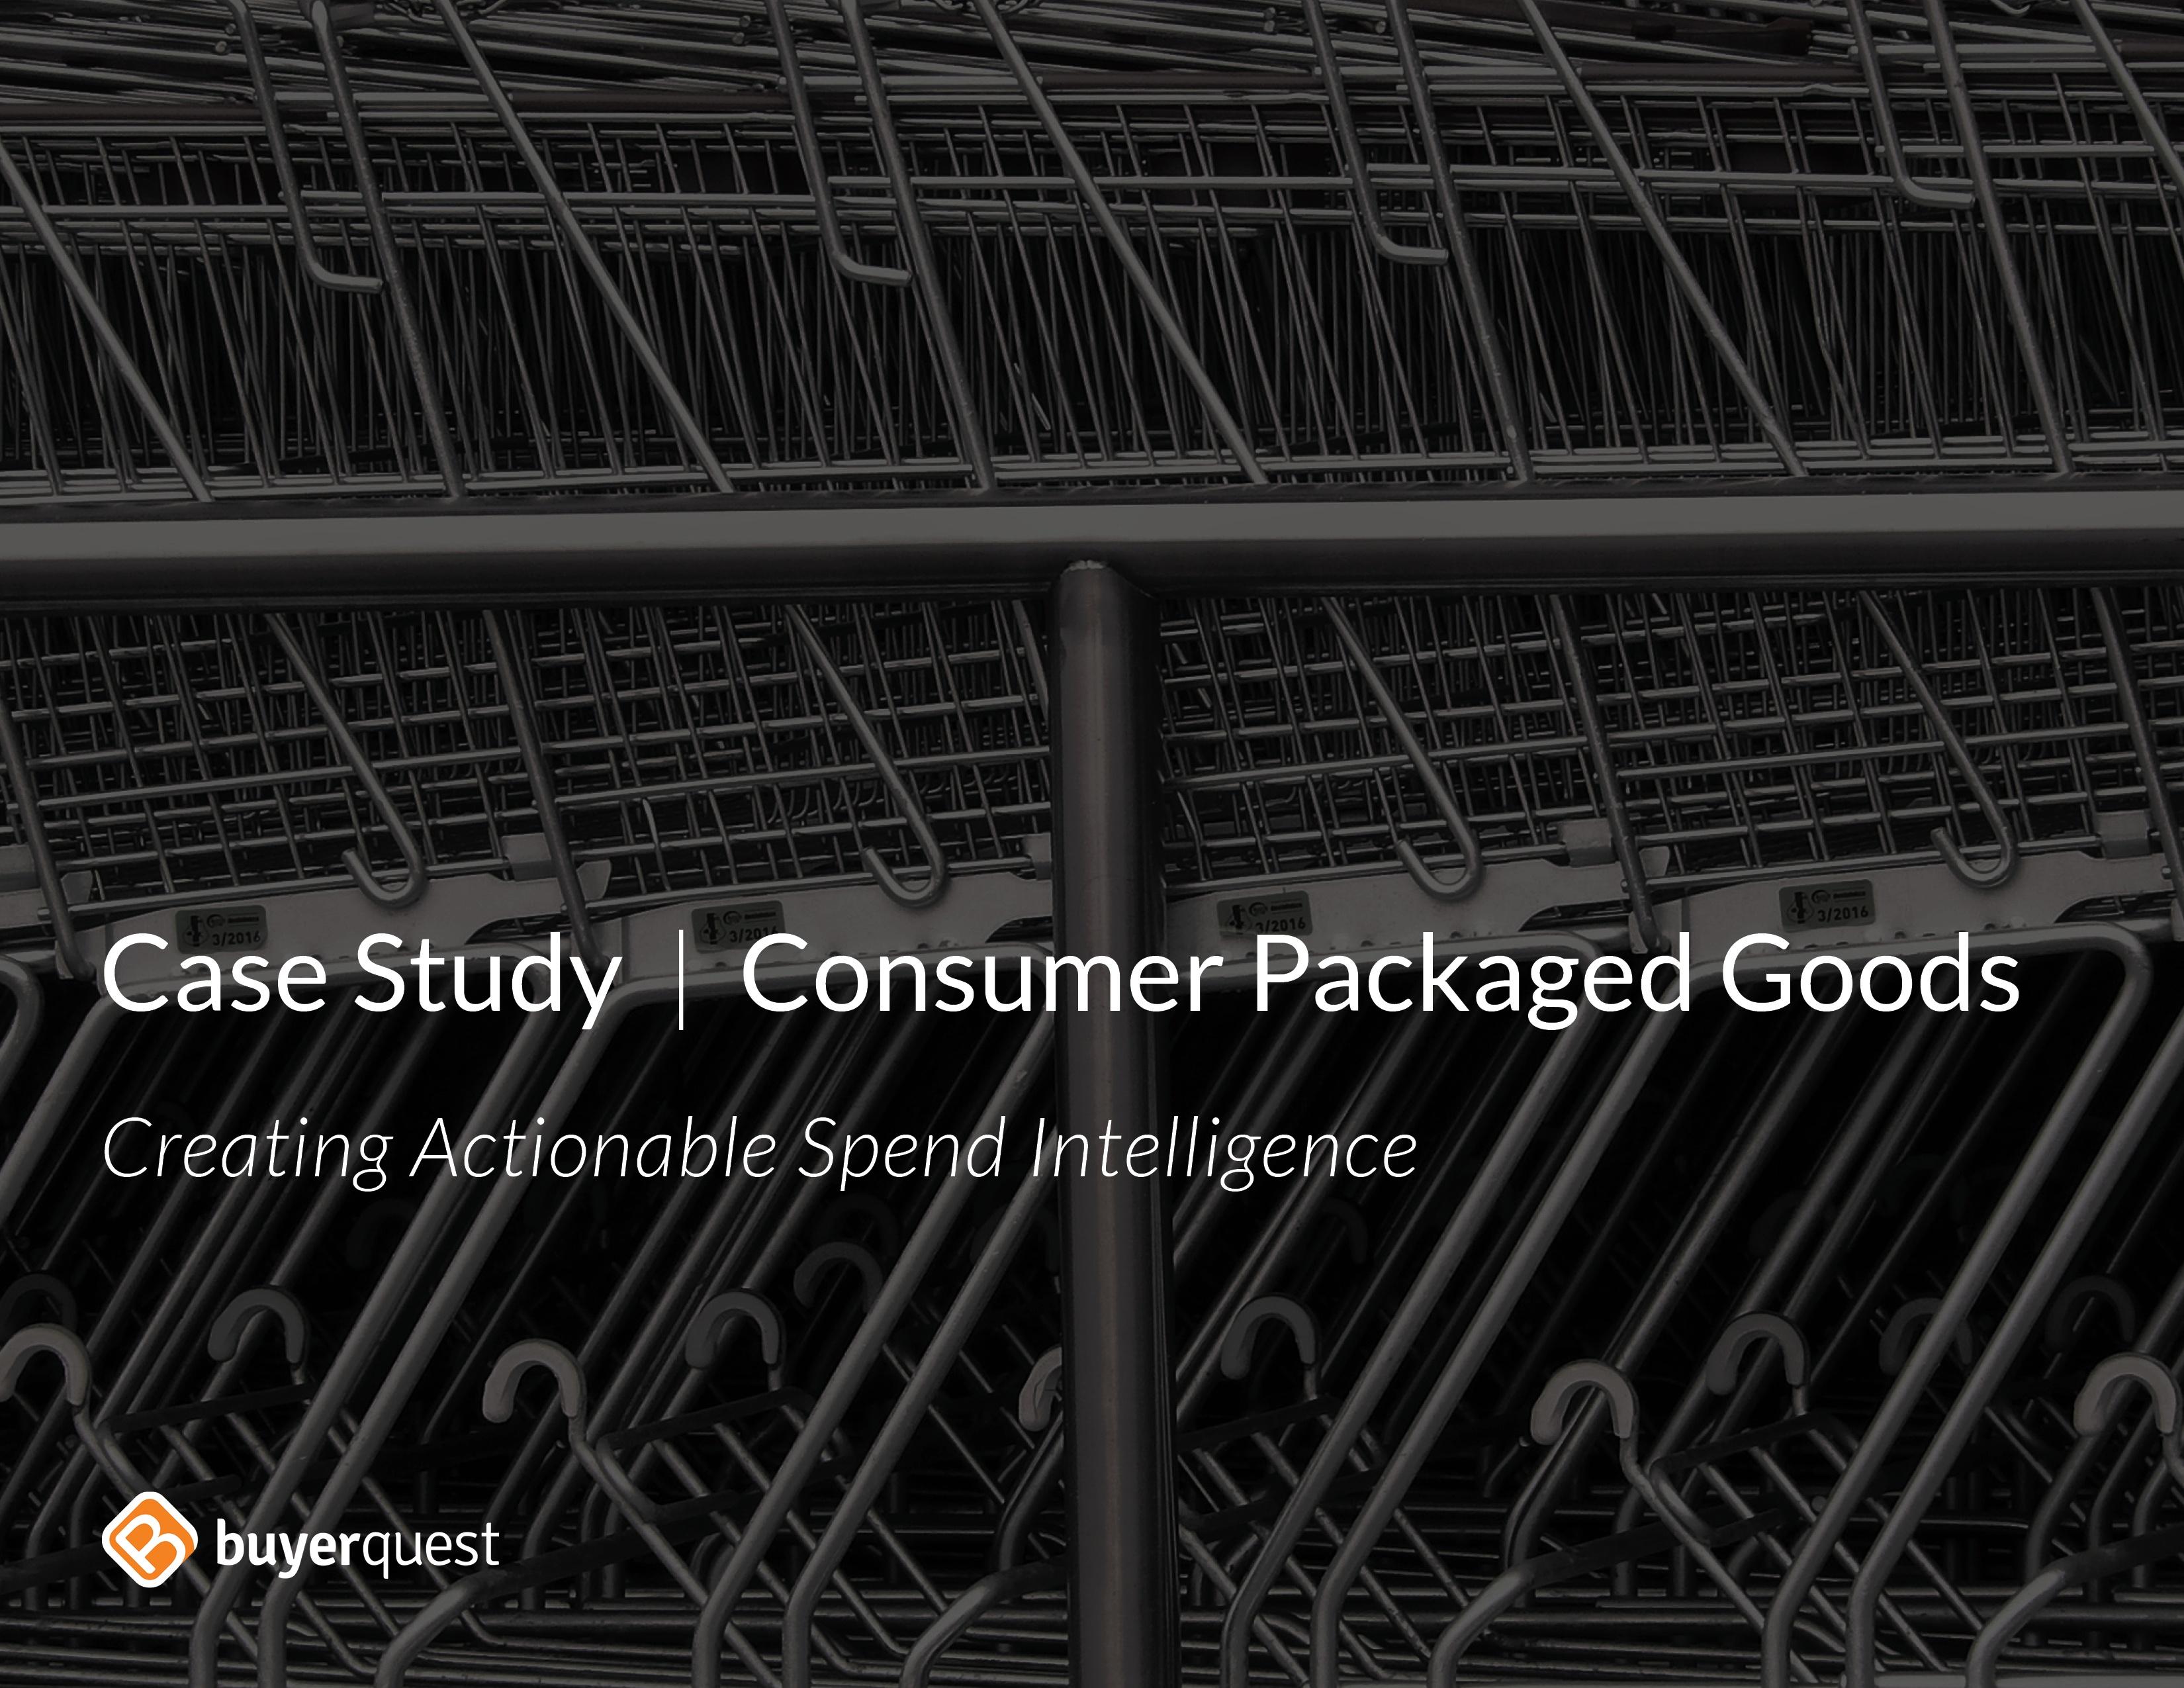 Consumer Packaged Goods